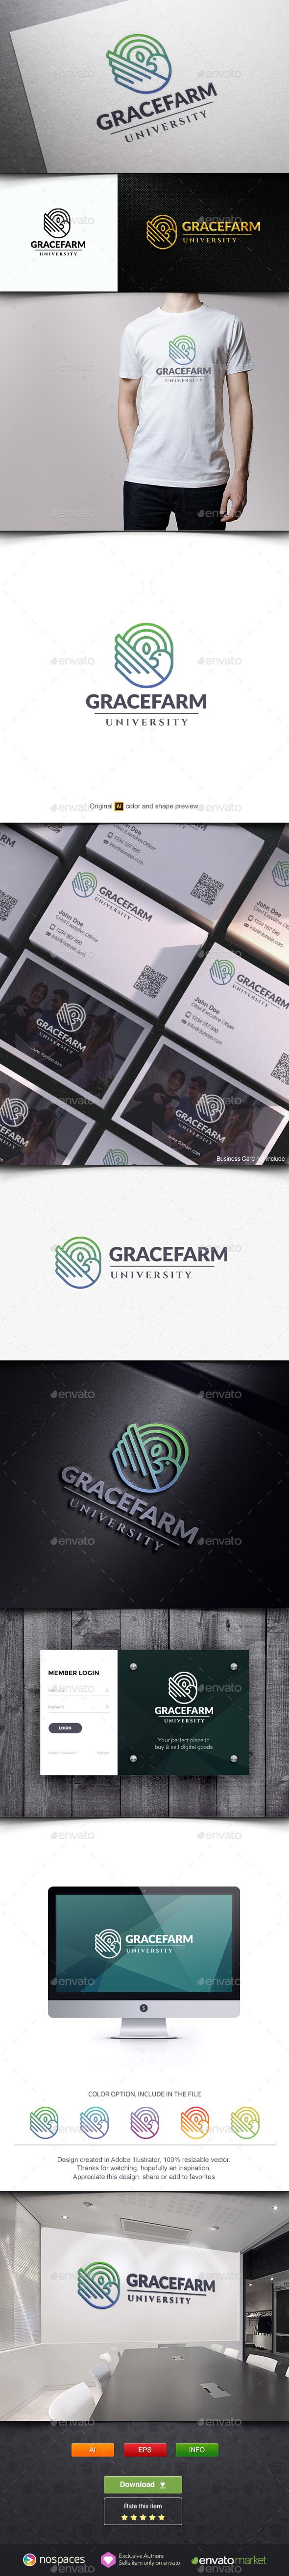 Grace Farm